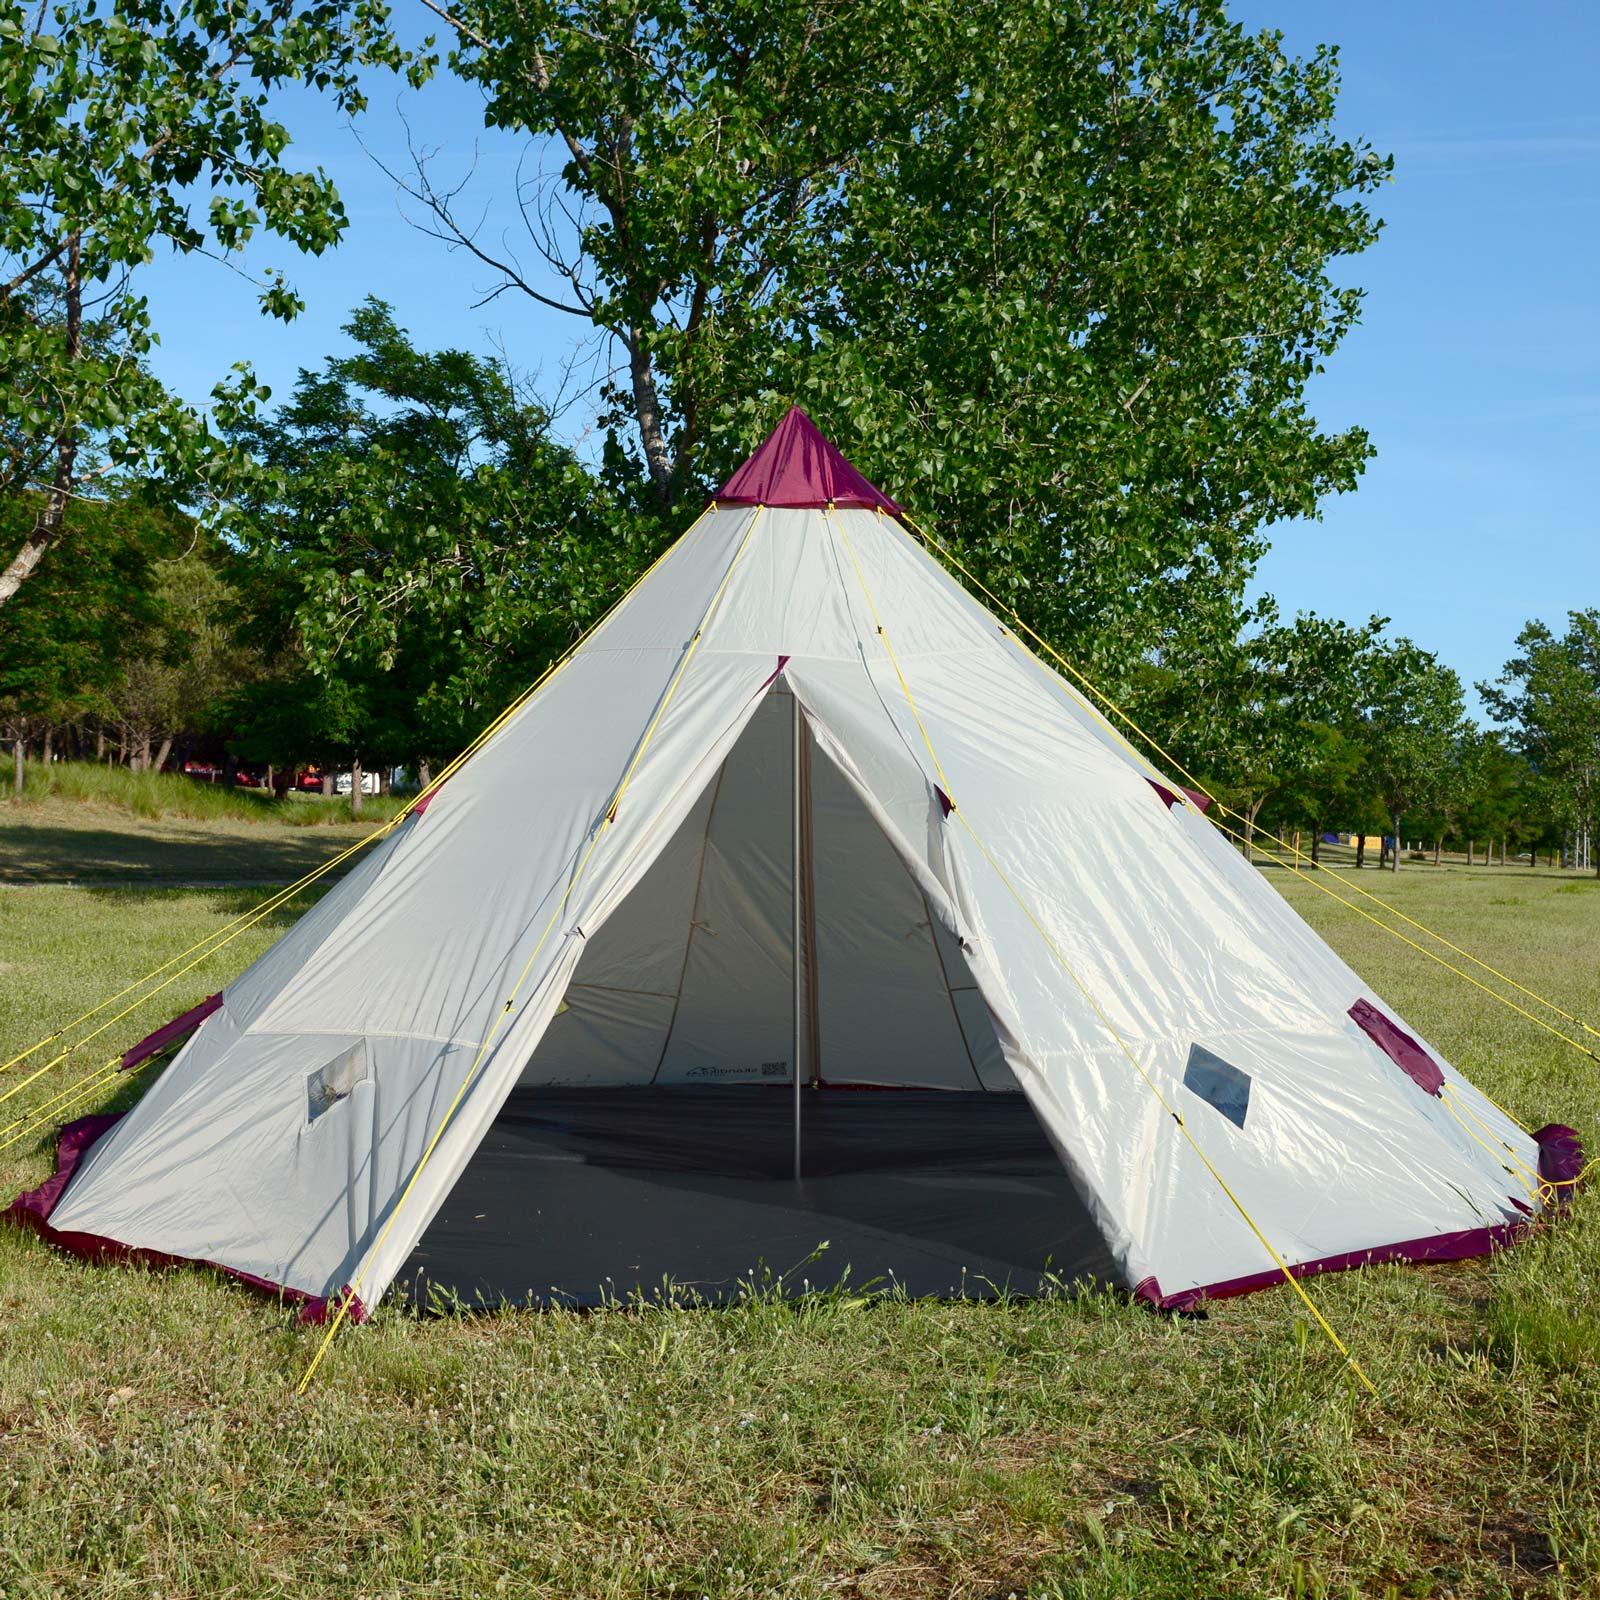 skandika-Teepee-250-Camping-Party-Festival-Tent-2-5-M-Height-3000mm-Column-New thumbnail 5